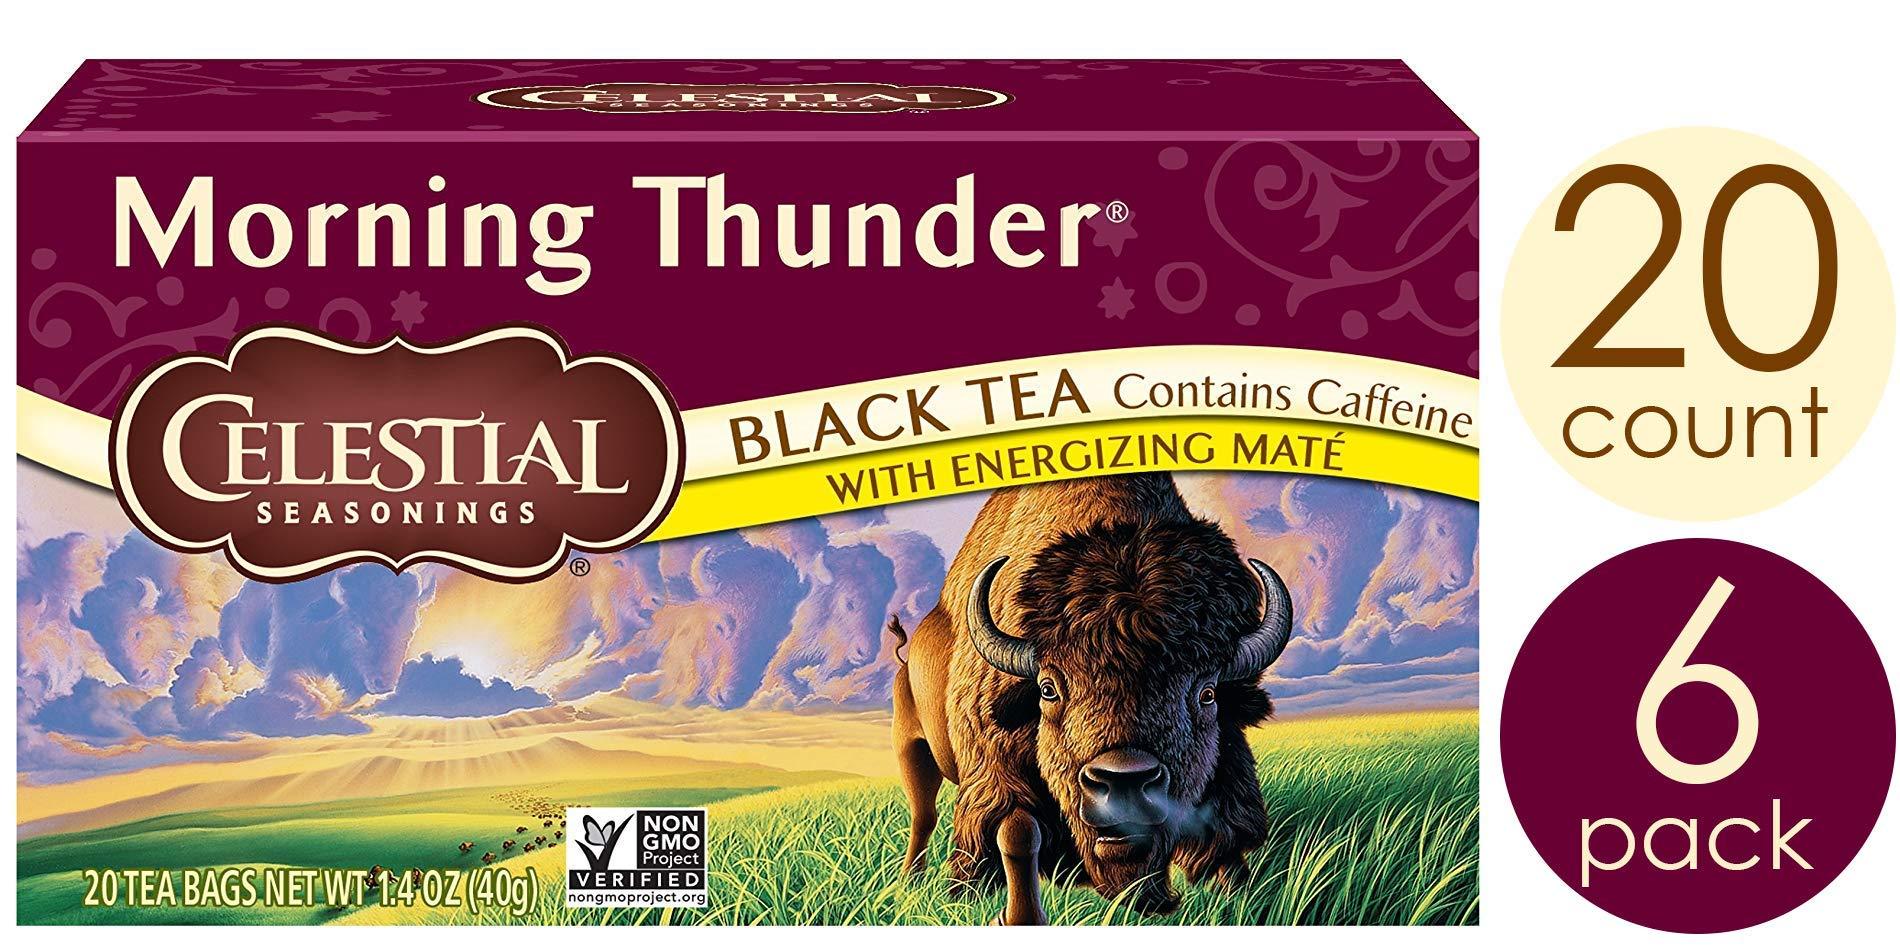 Celestial Seasonings Black Tea, Morning Thunder with Maté, 20 Count (Pack of 6) by Celestial Seasonings